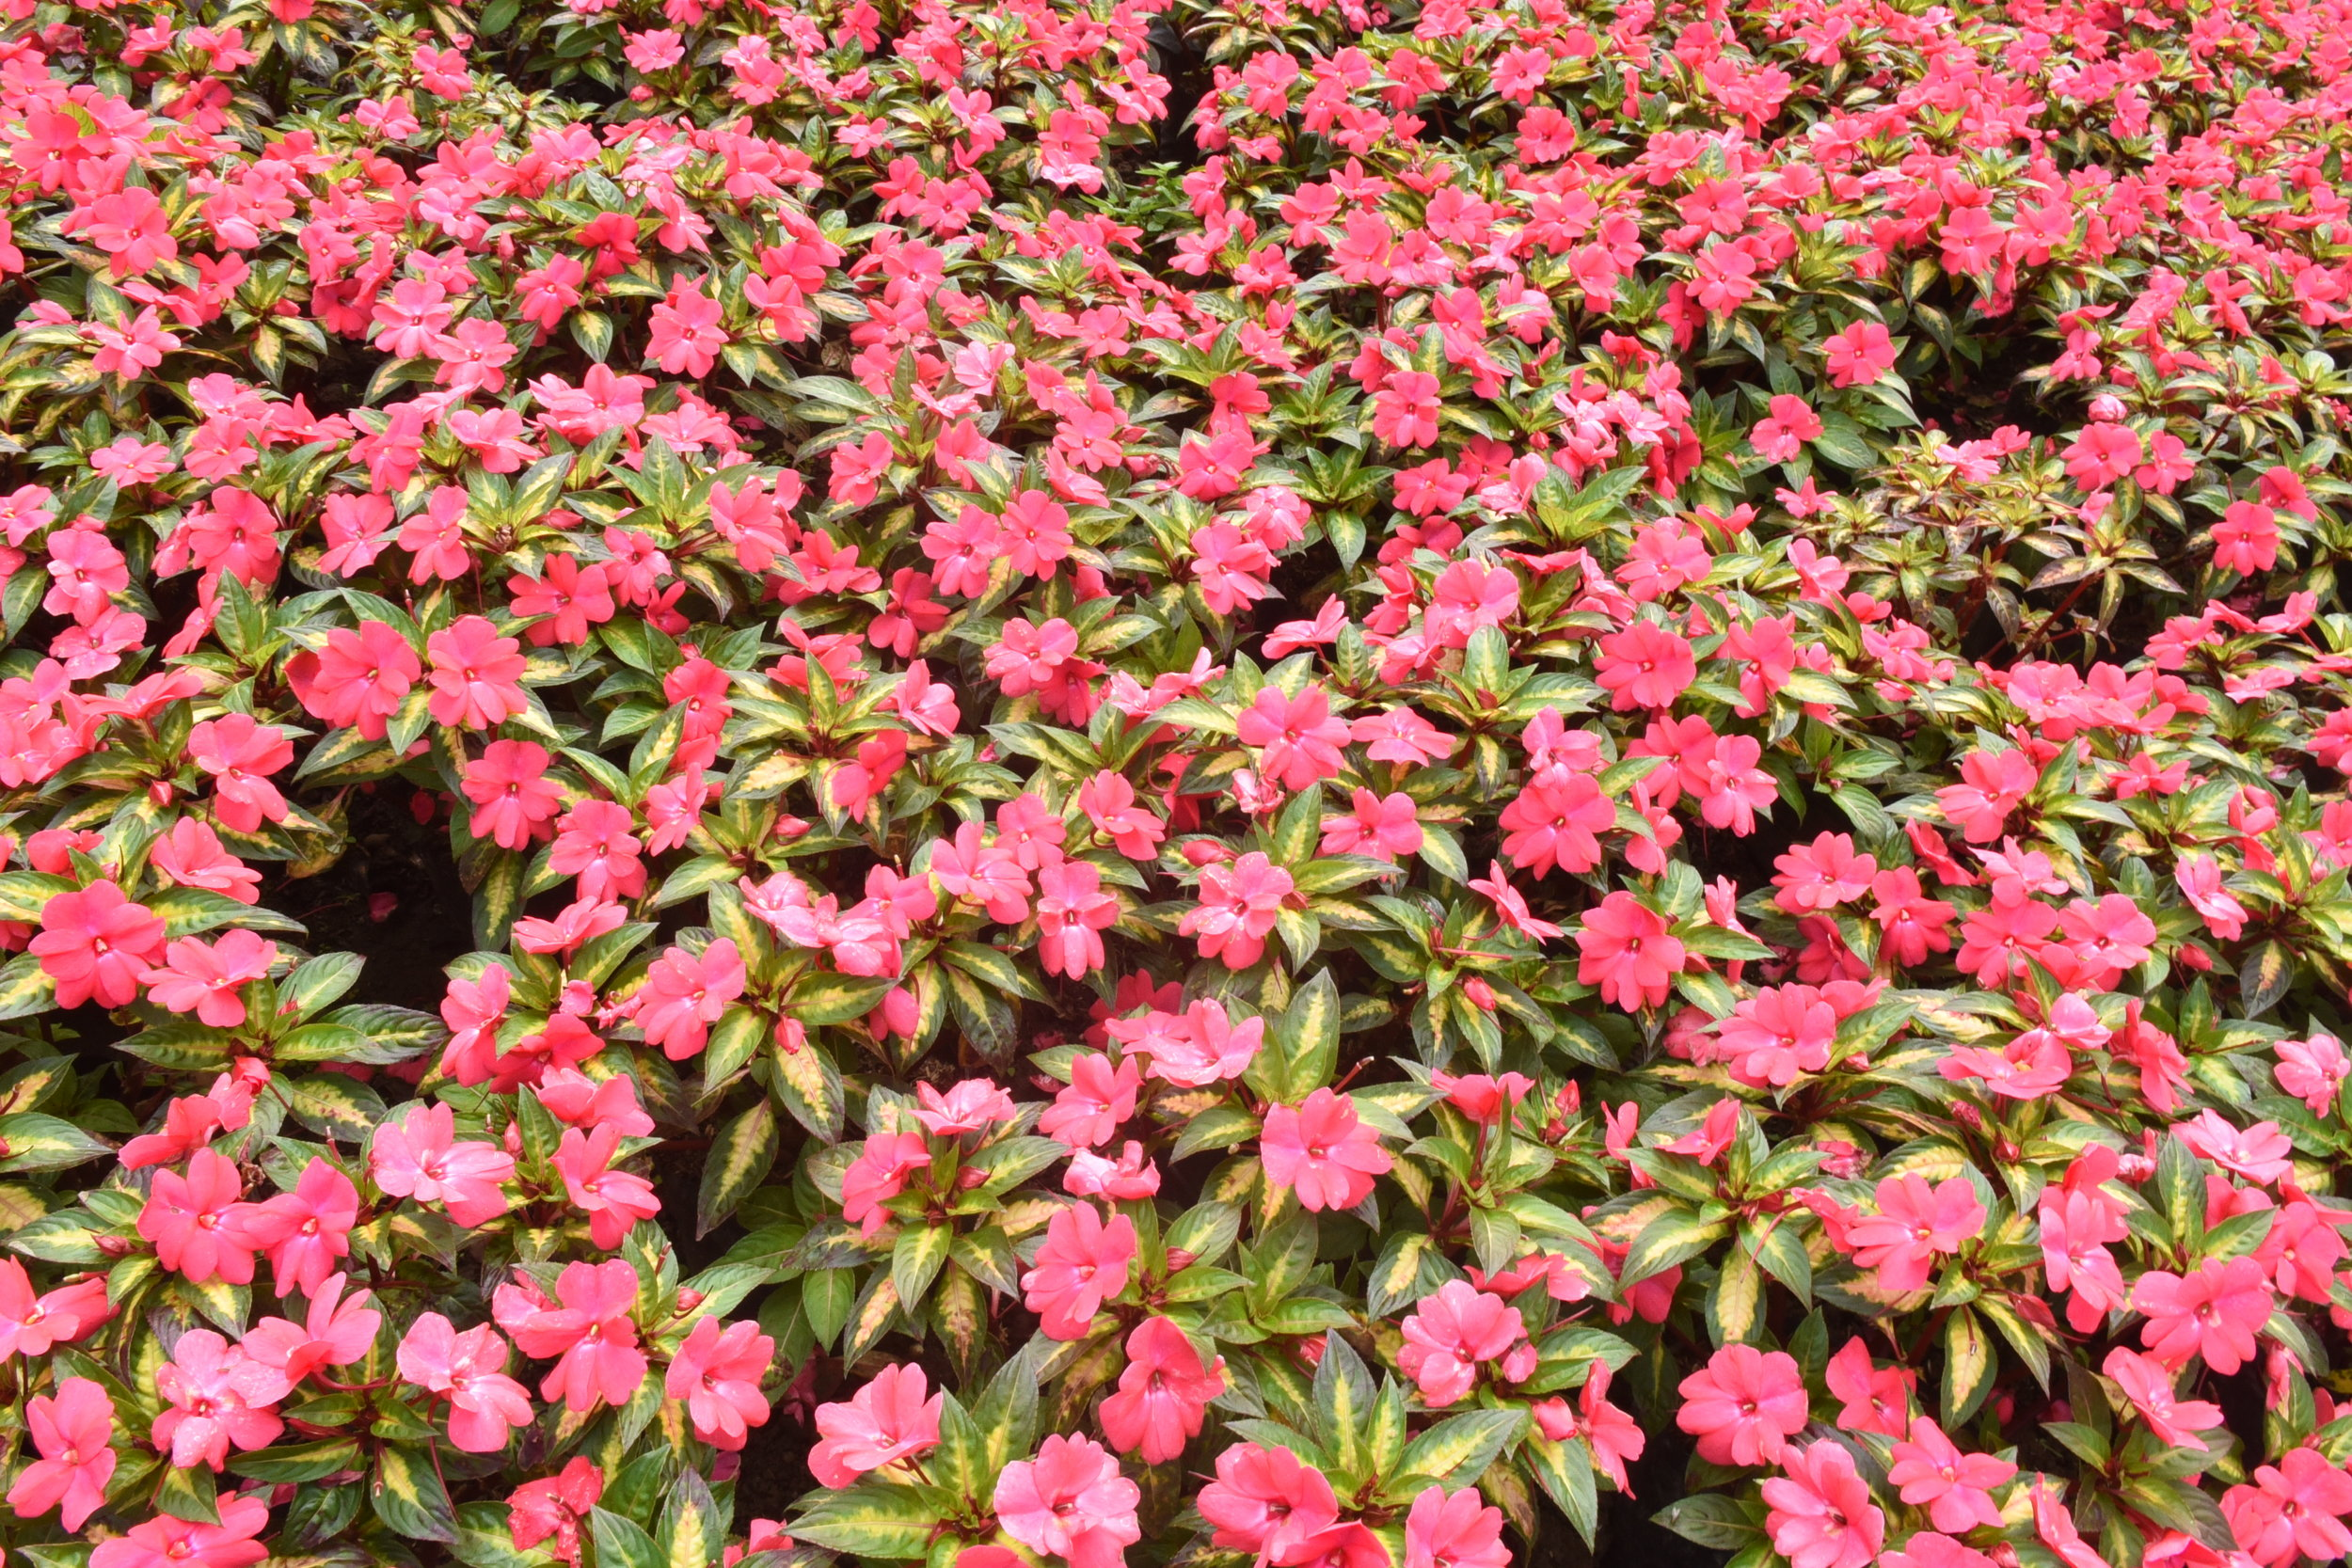 Flowering plants in the Electric Garden